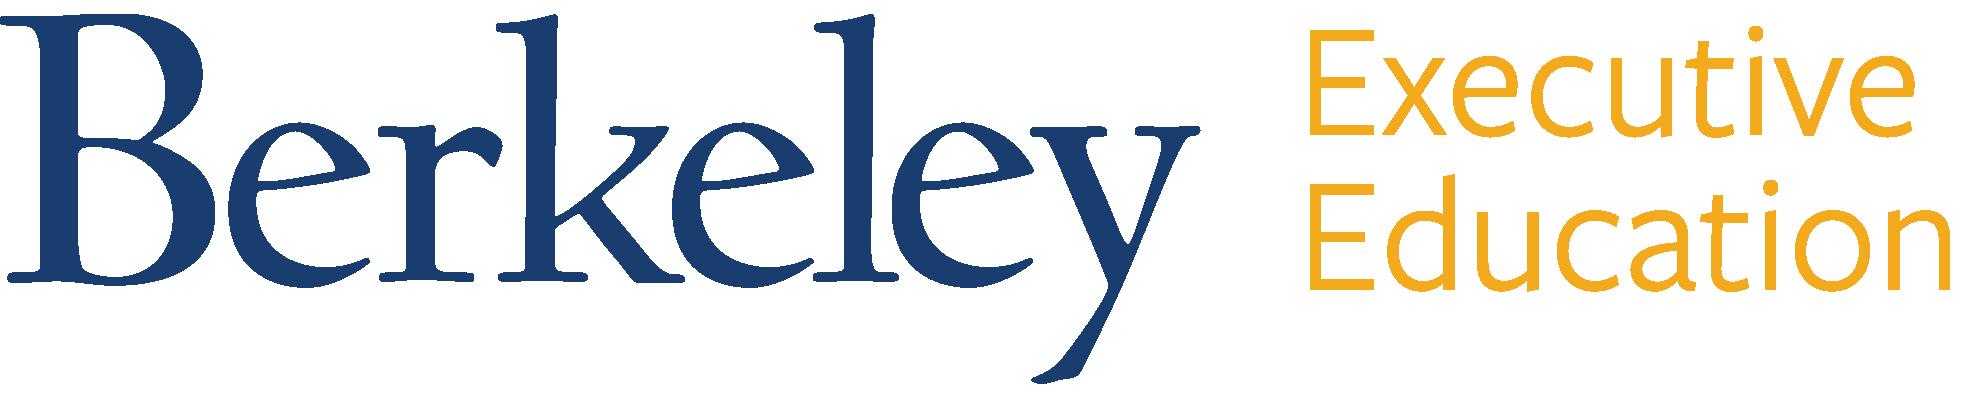 UC Berkeley Executive Education